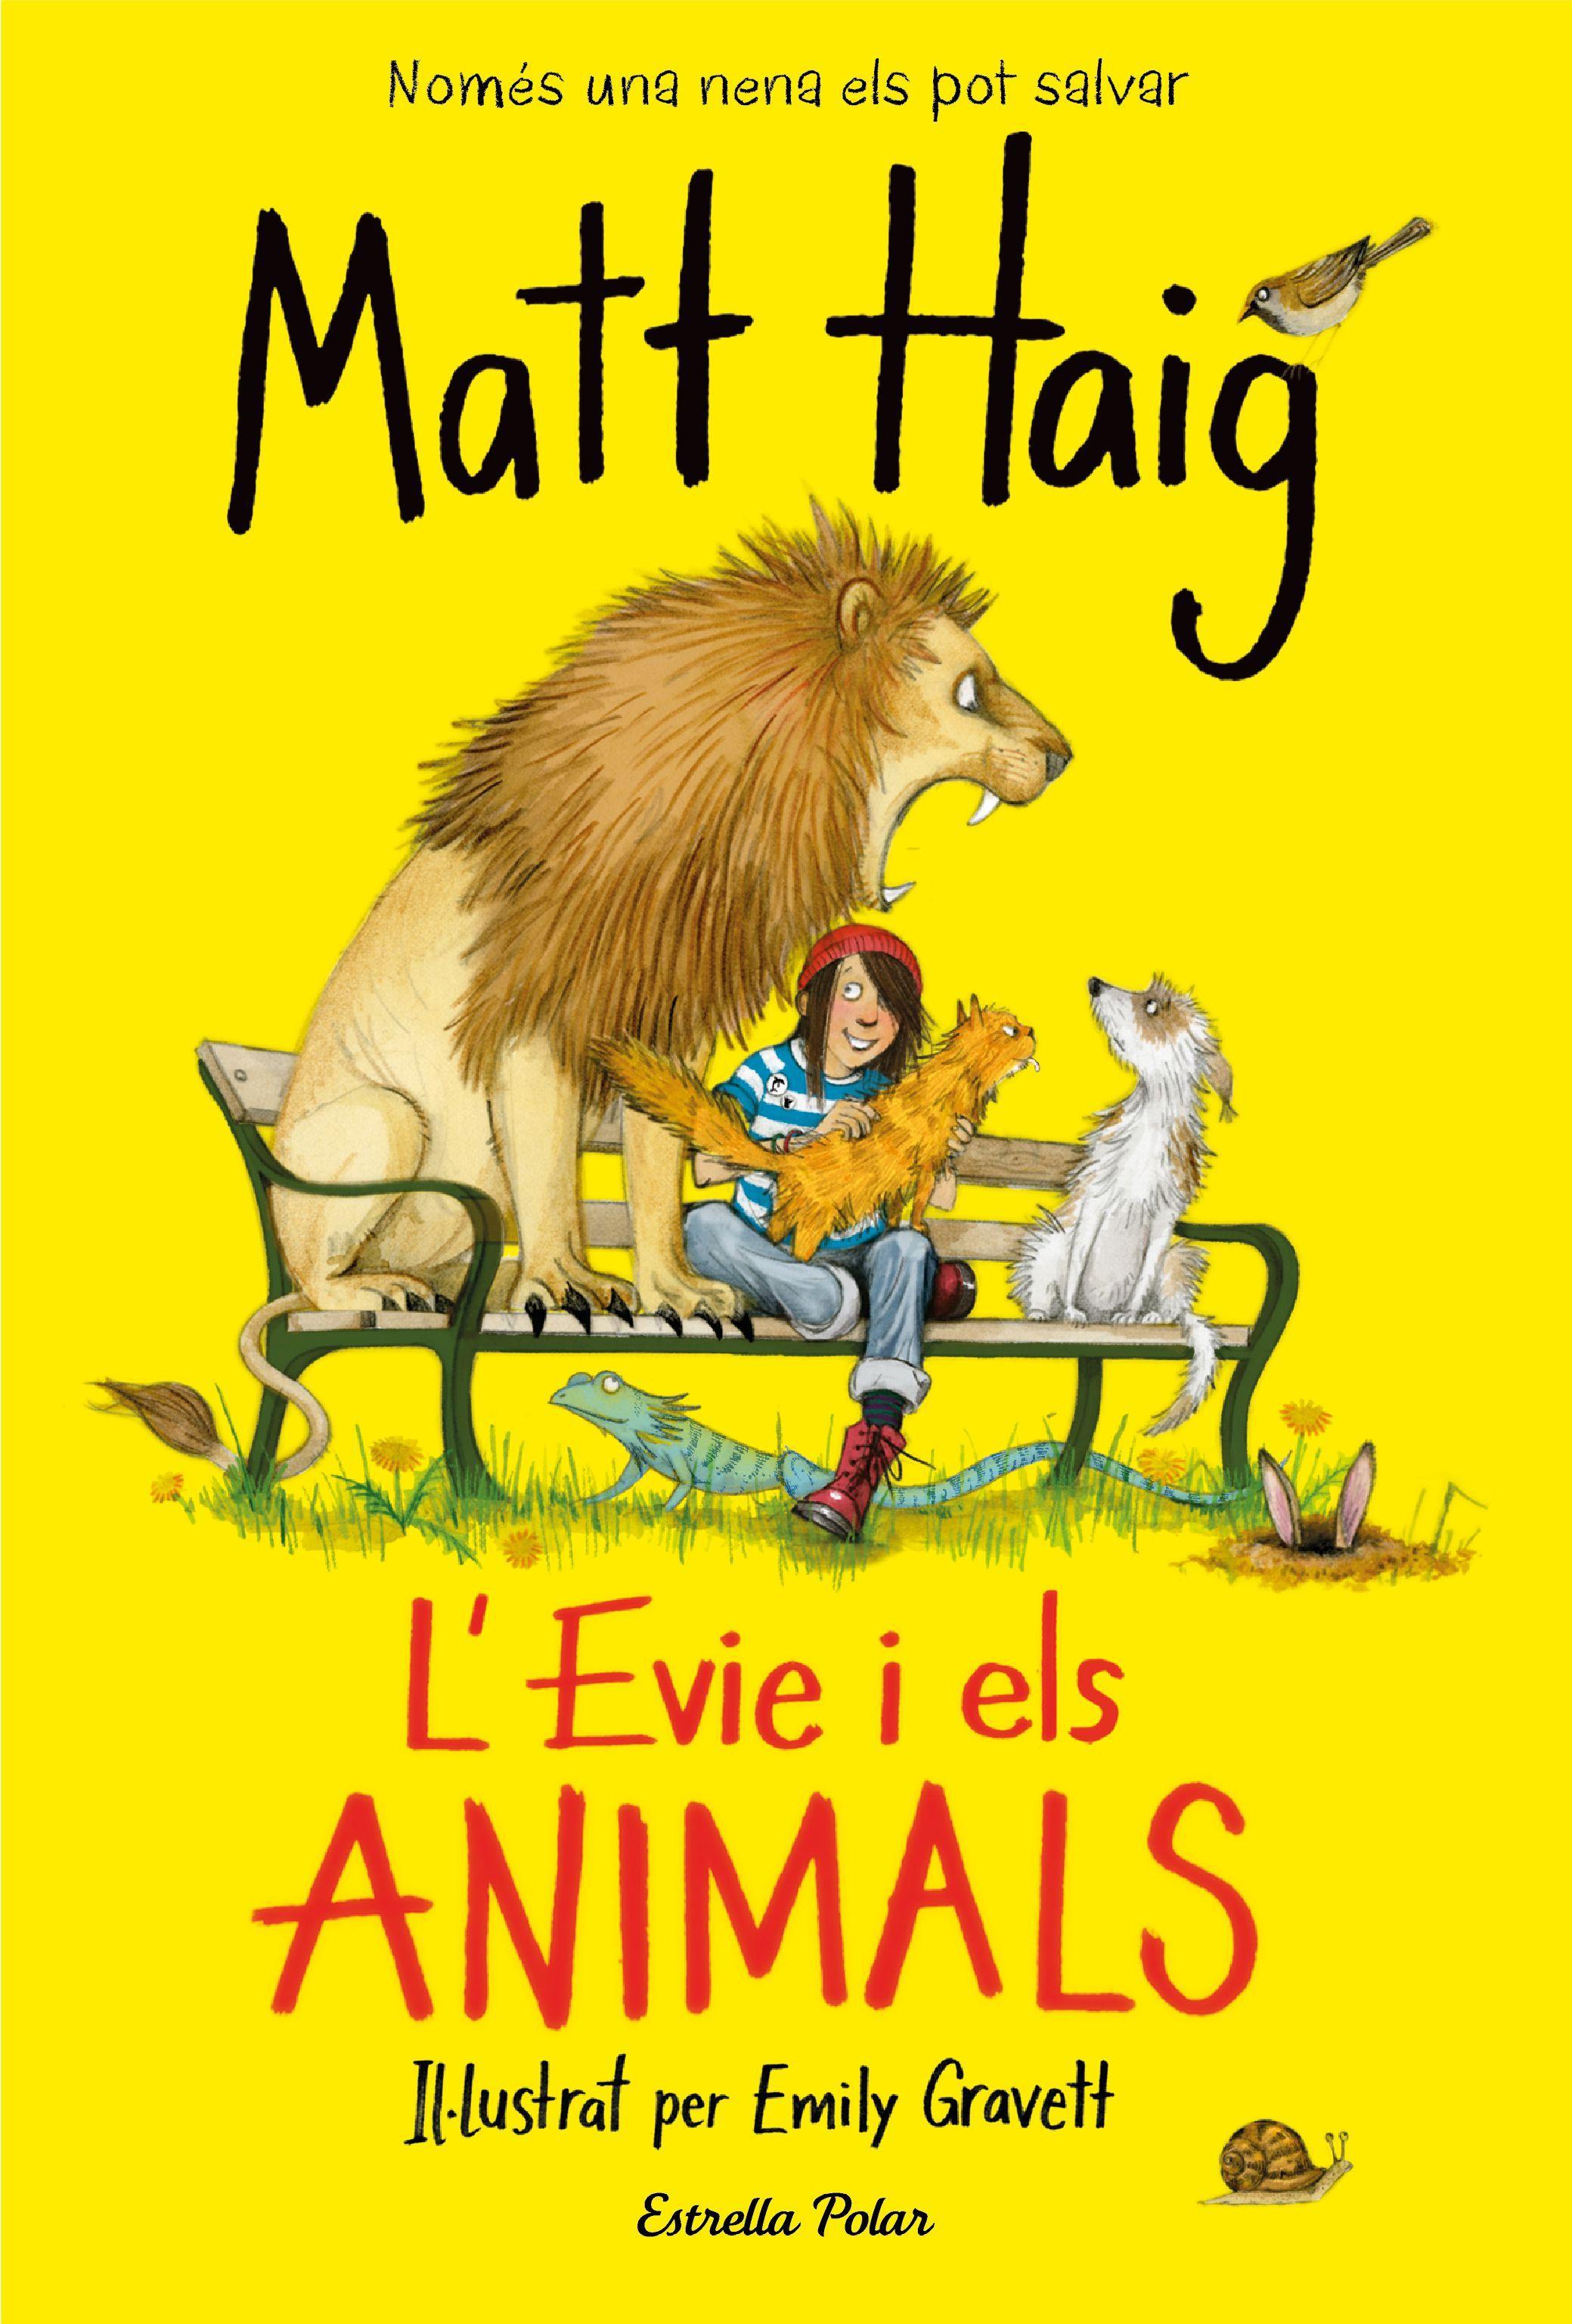 EVIE I ELS ANIMALS